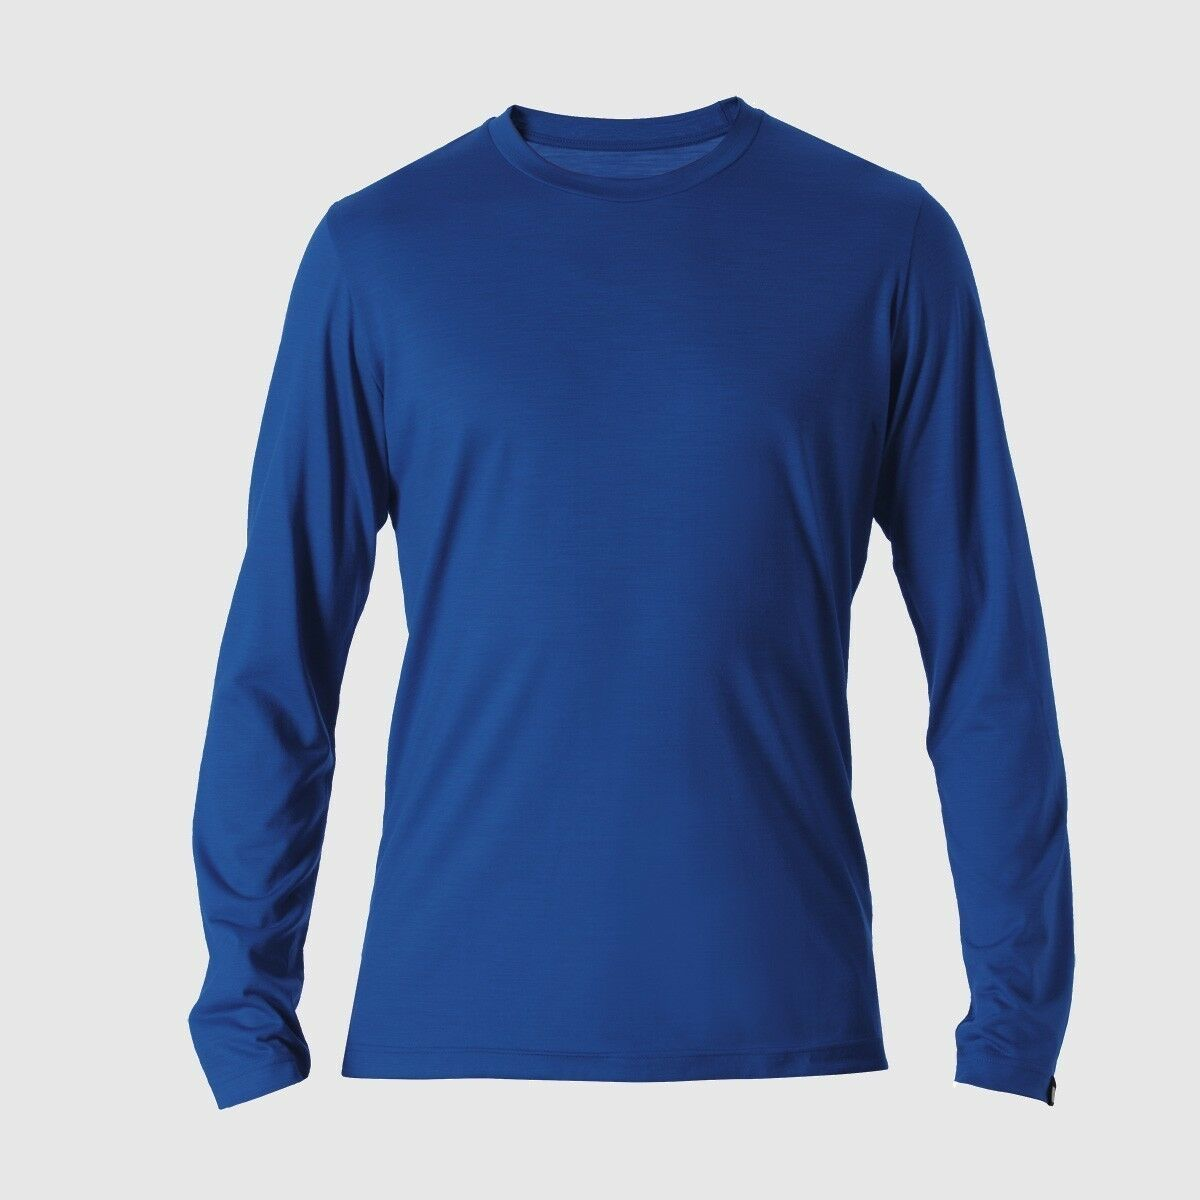 rotA Rewoolution Grab  Mens T Shirt Long Sleeve 140  process Blau  Merinowolle